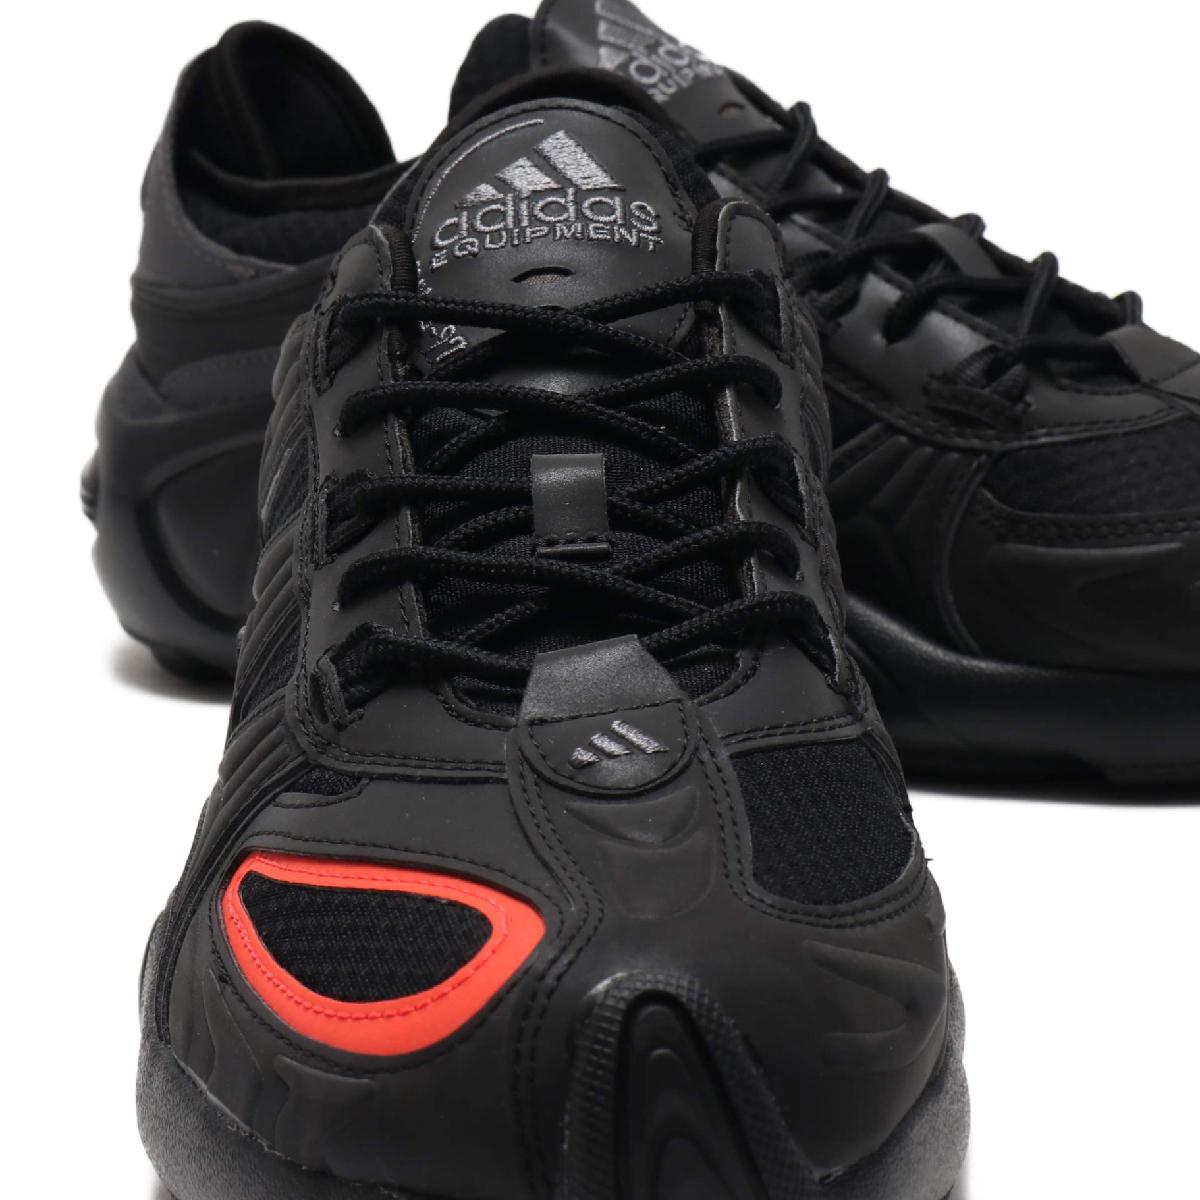 adidas Originals FYW S 97 (Adidas originals fee twoware S 97) CORE BLACKCORE BLACKSOLAR RED 19FW I